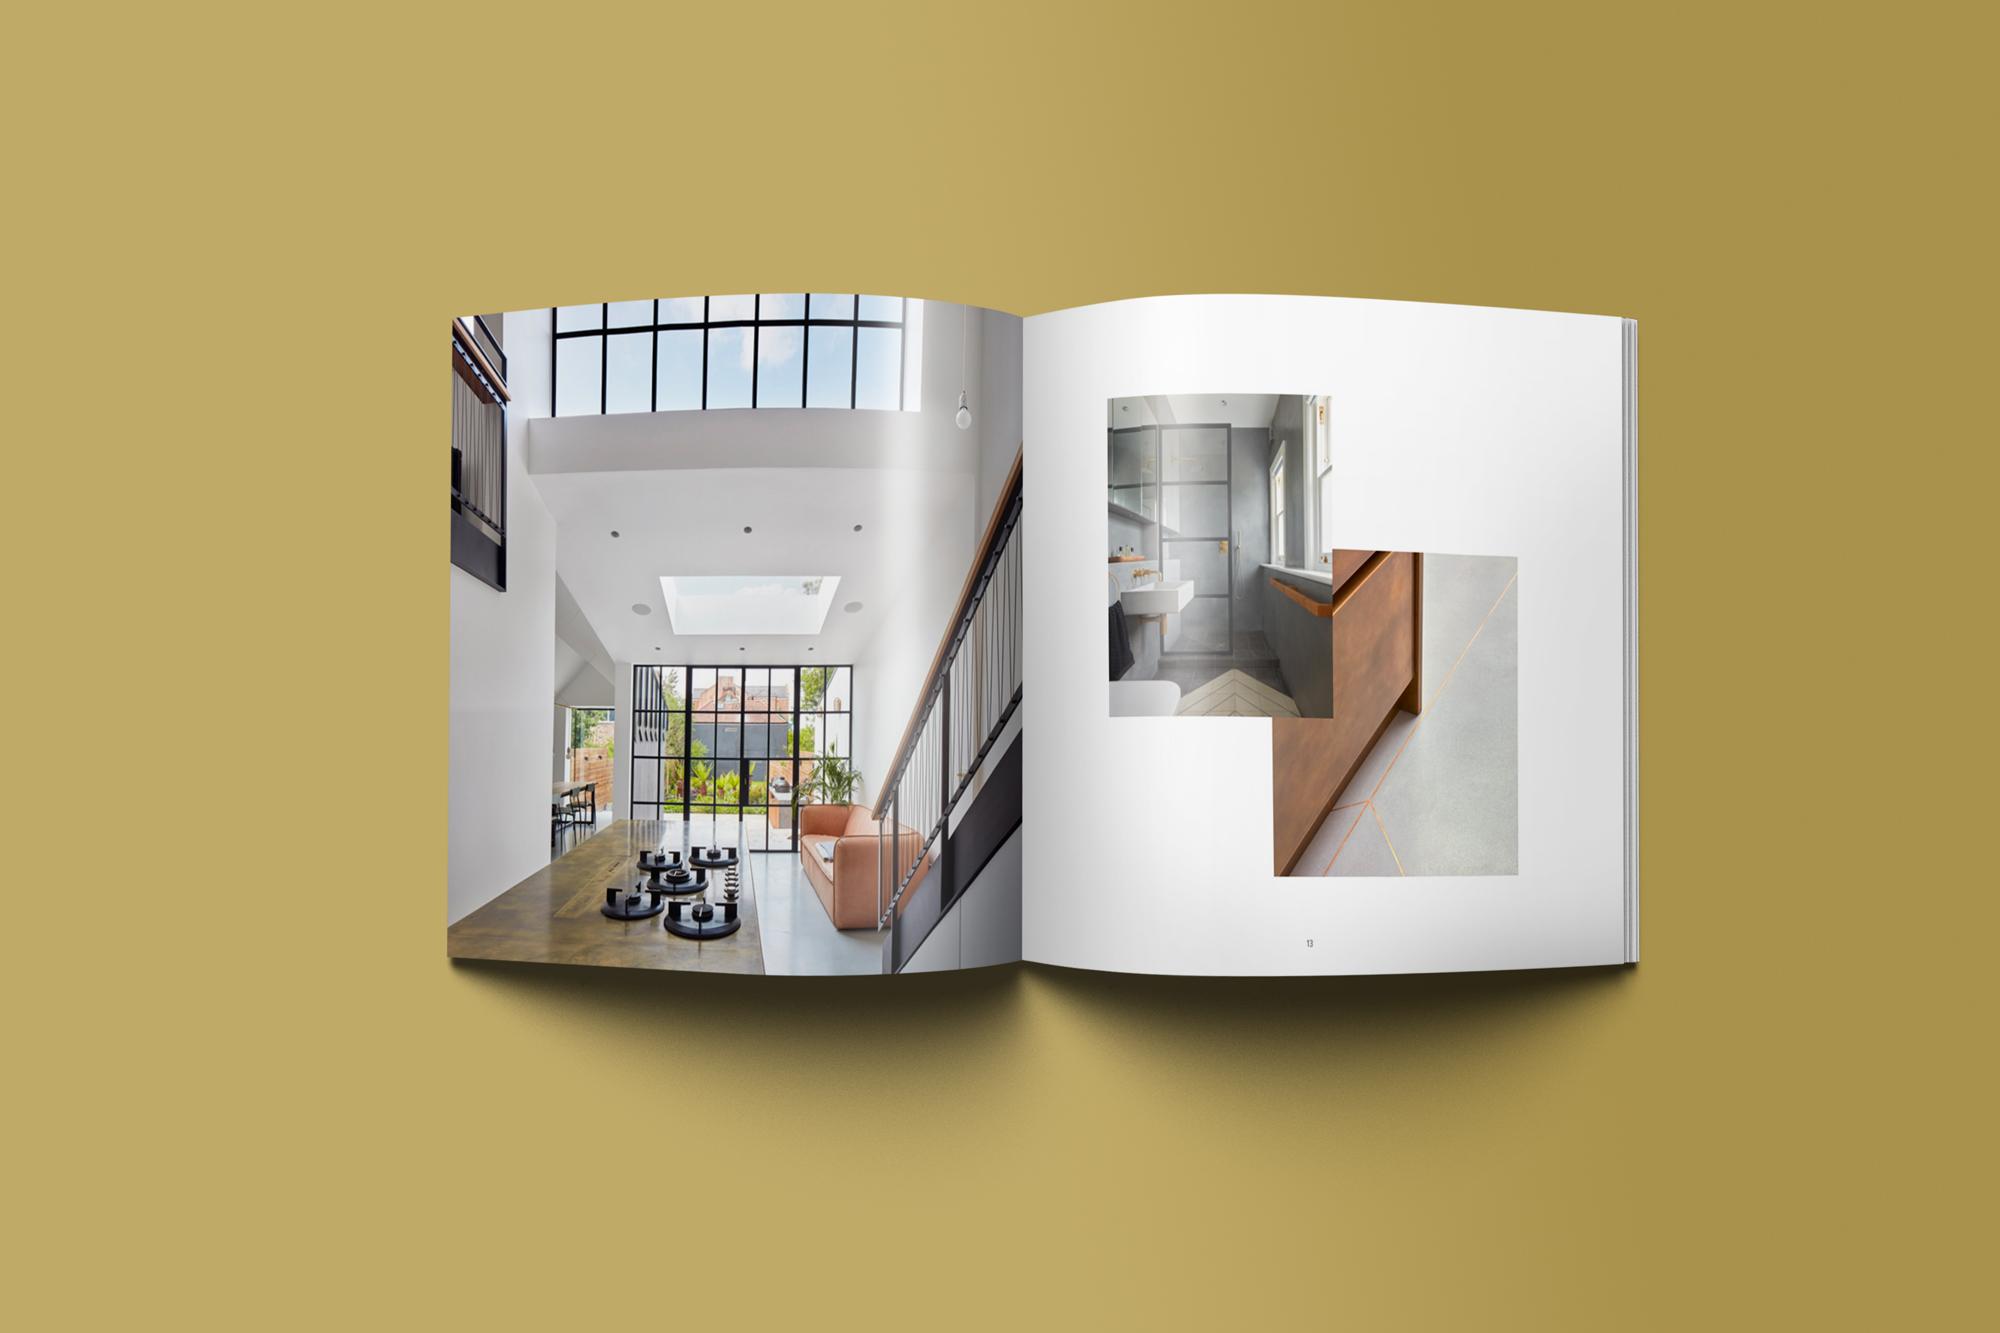 Studio-RDNx-Portfolio-Marssaie-Studio-sprd-04.jpg